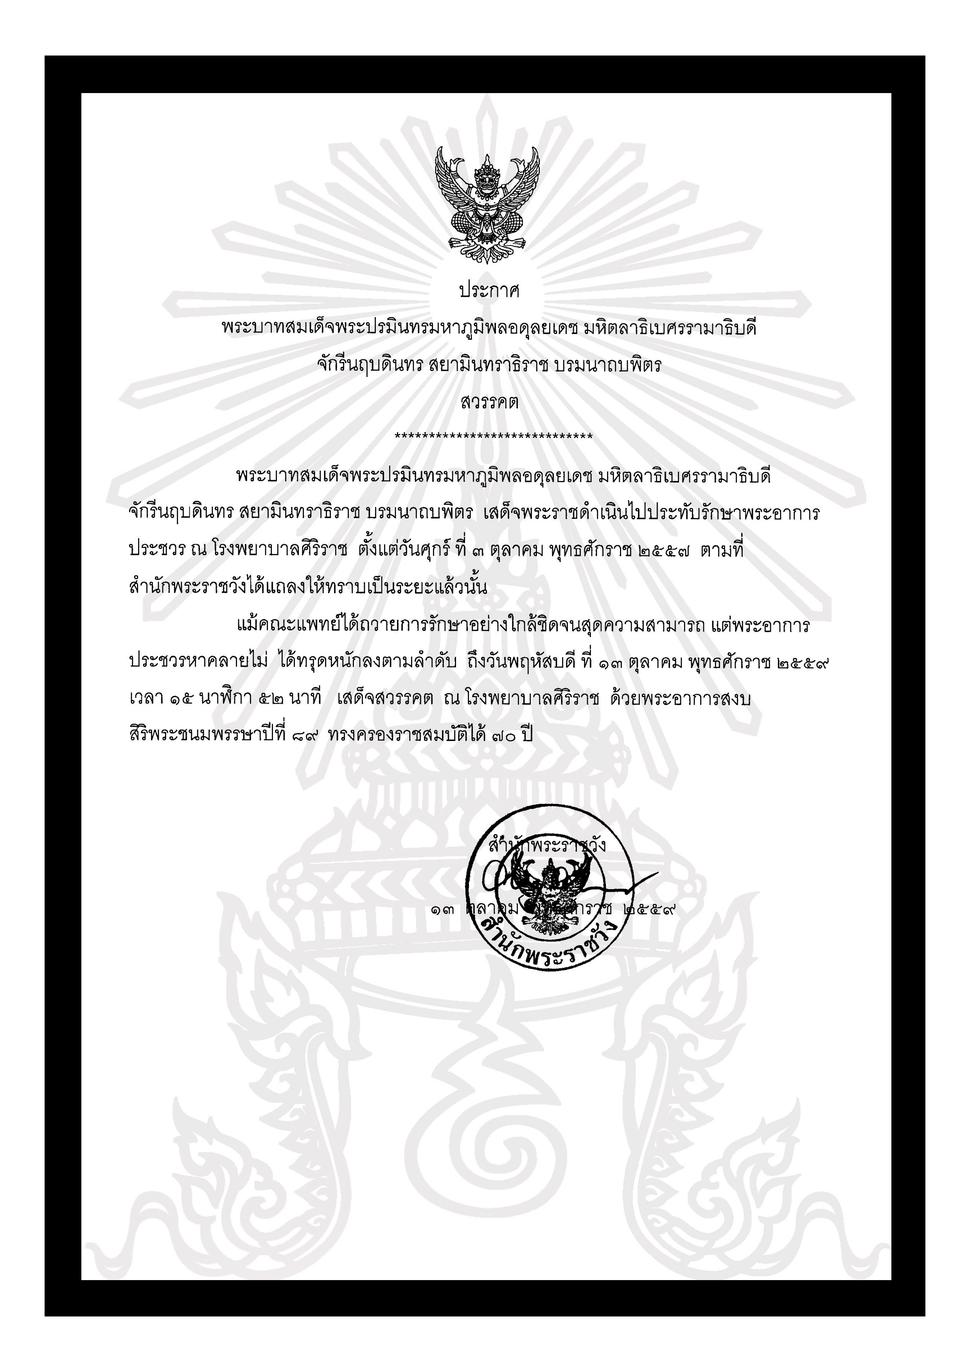 Announcement of the death of HM King Bhumibol Adulyadej